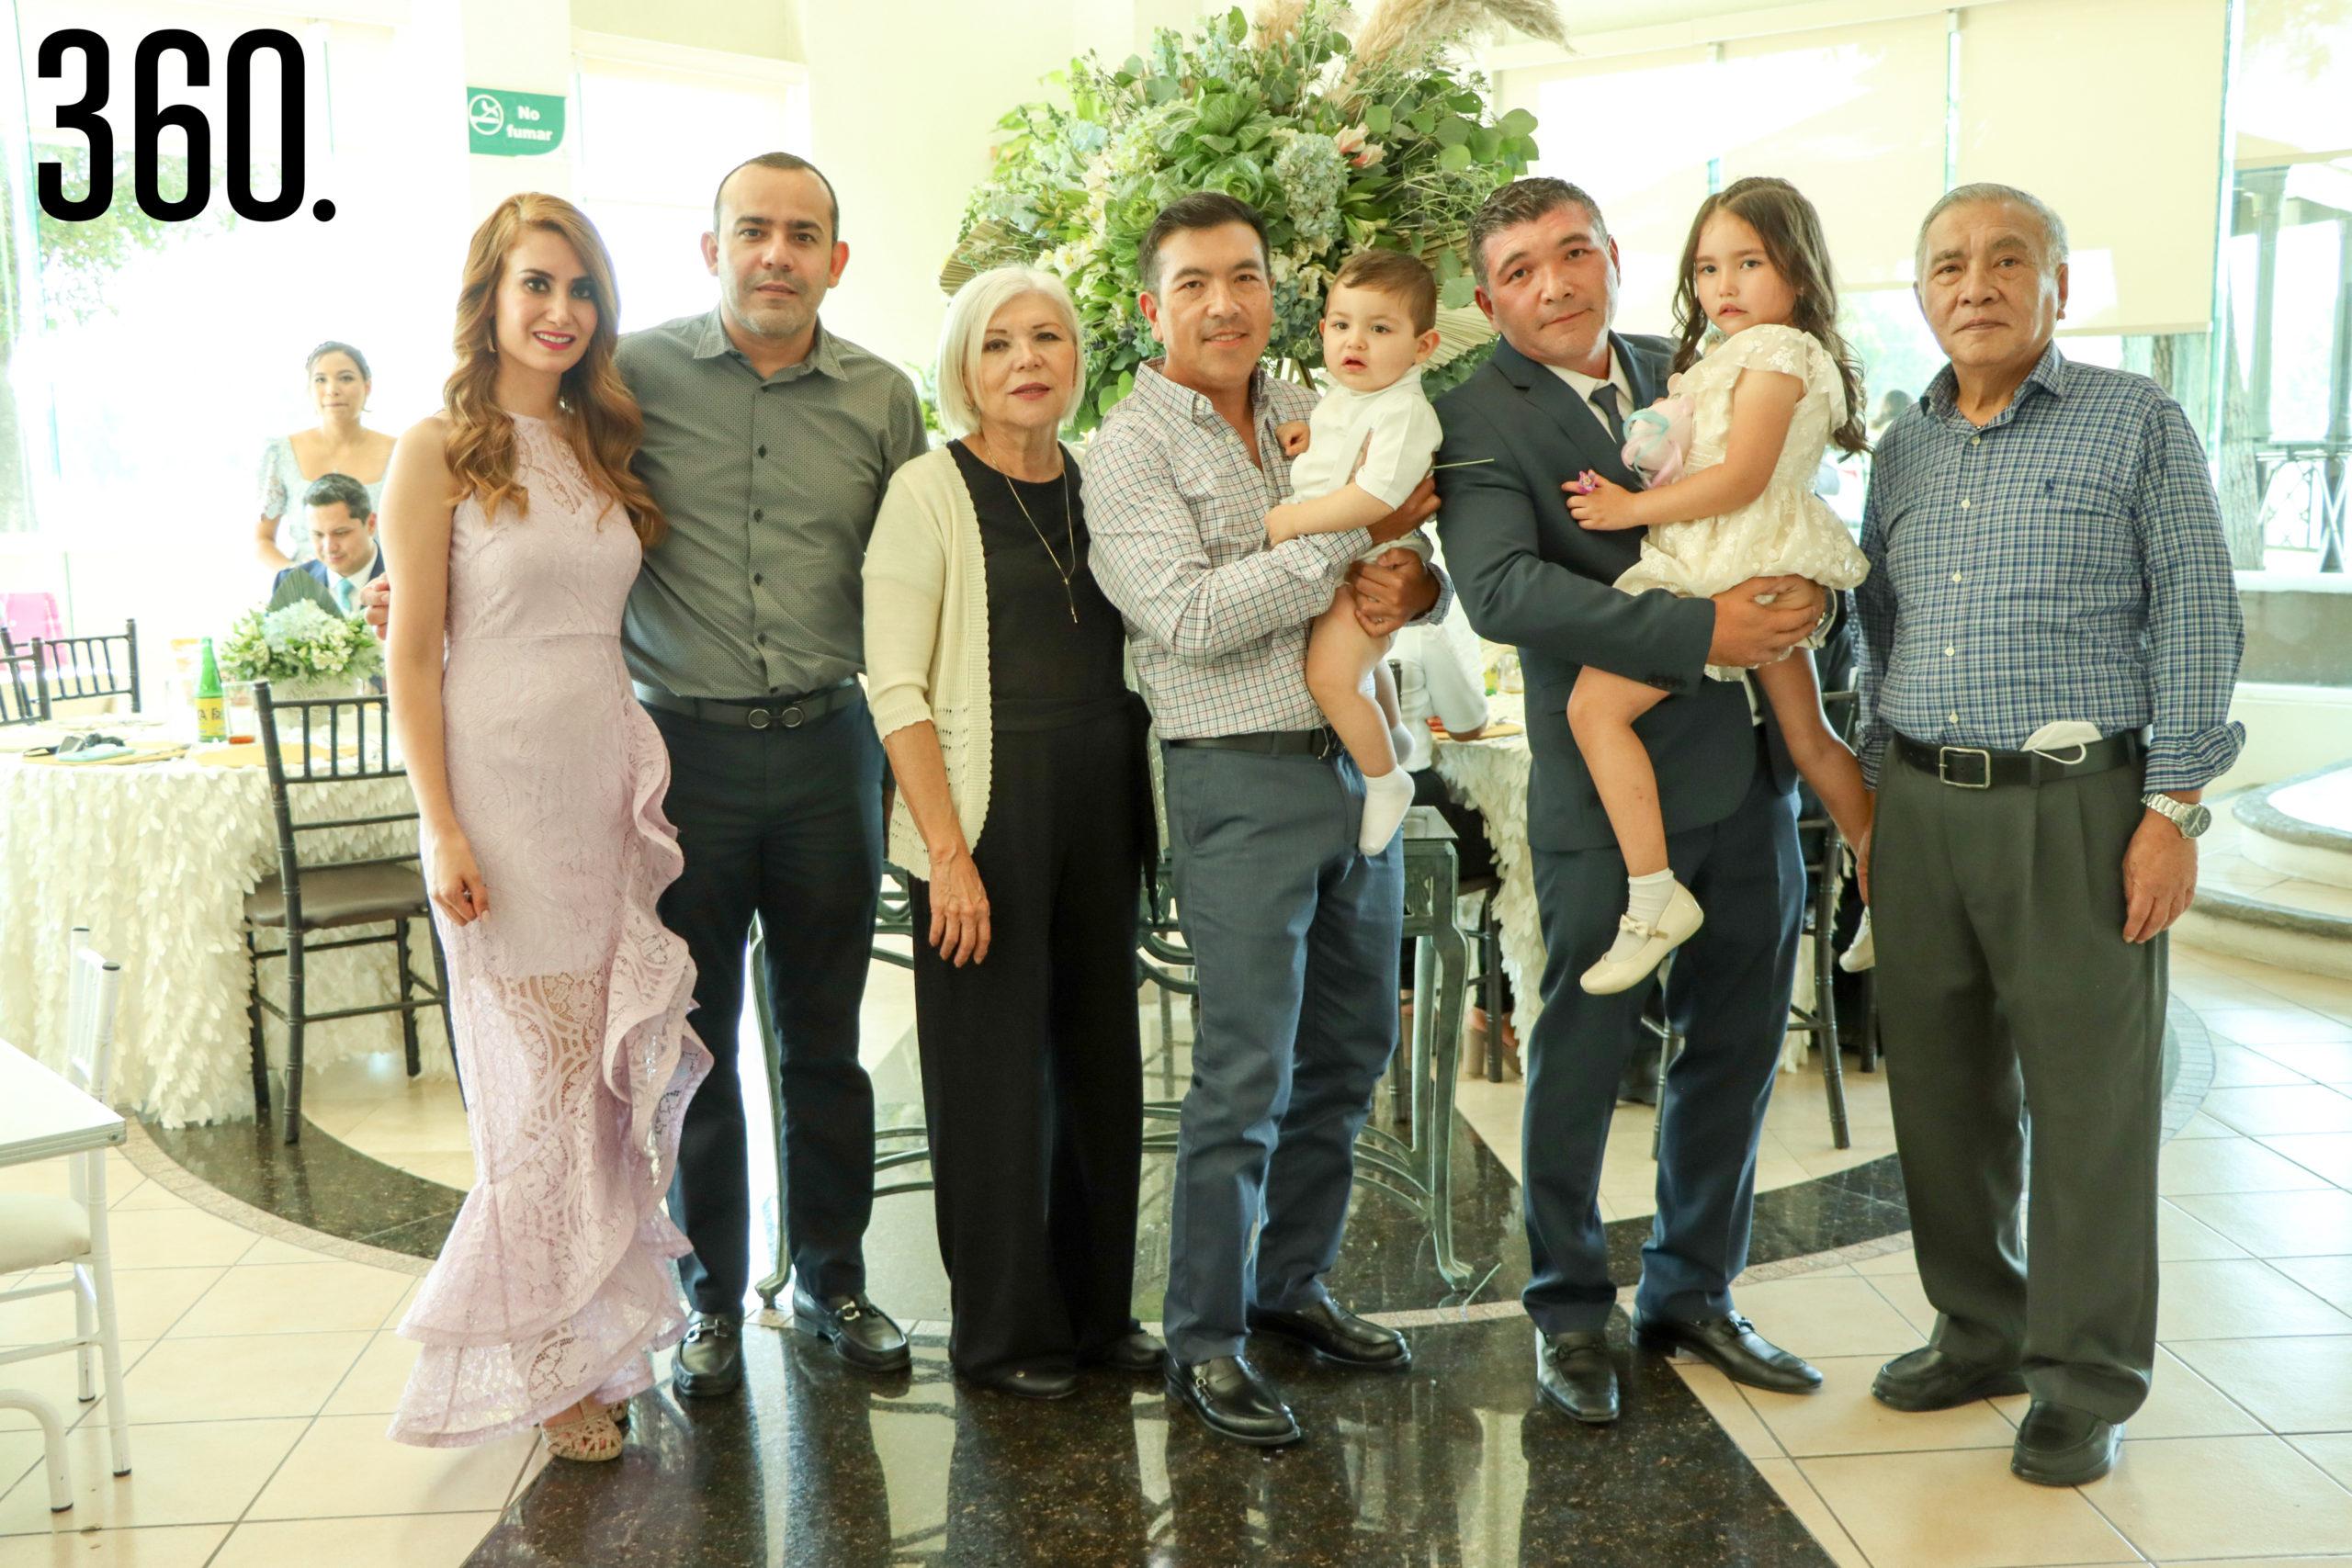 Ireri Vargas, Gaspar Acosta, Martha Ibarra, Jorge Woo, Carlos Arturo Woo, Carlos Woo, Eva Woo y Jorge Woo.